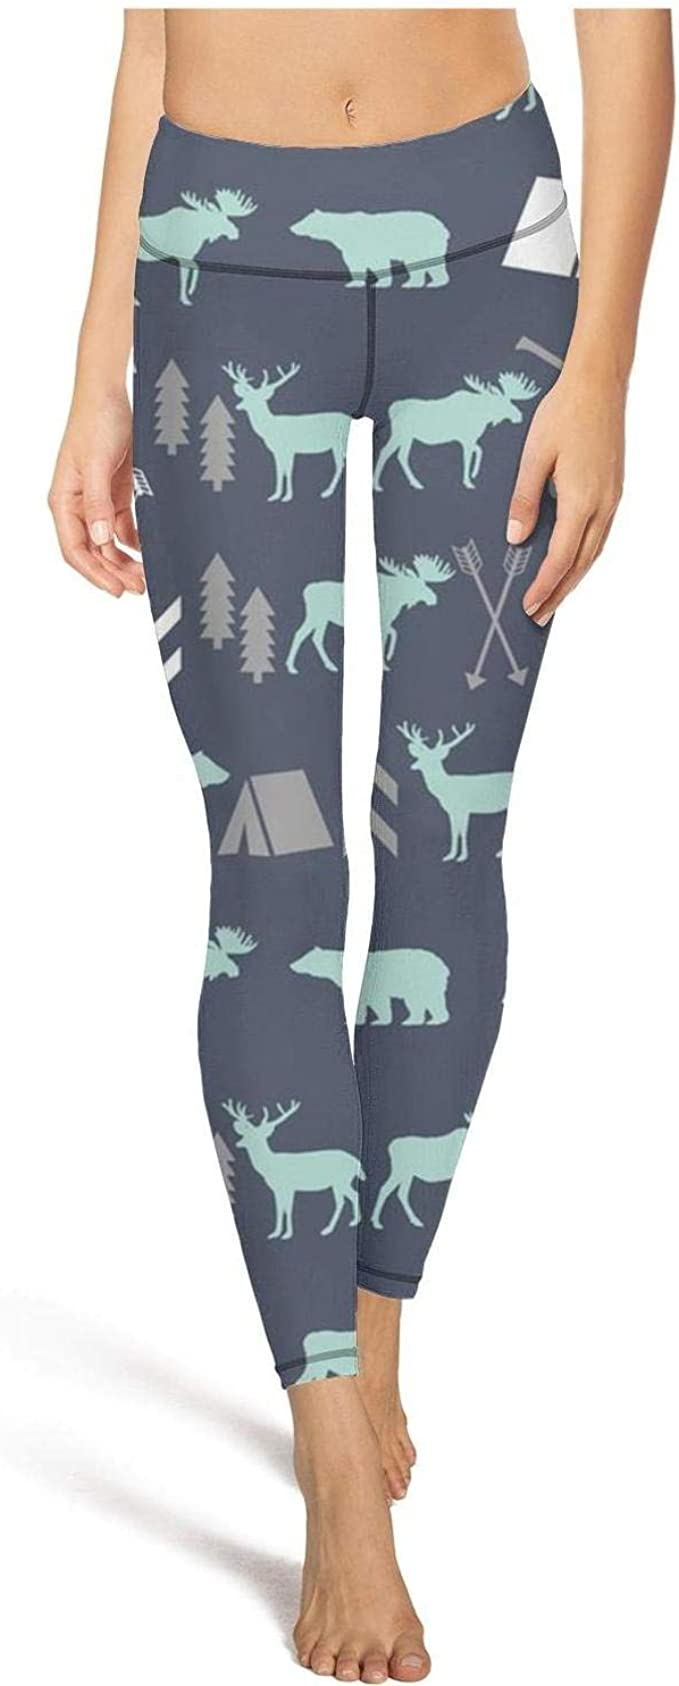 medssii Womens Yoga Pants Gray Leopard Print Super Soft Yoga Leggings with Pockets